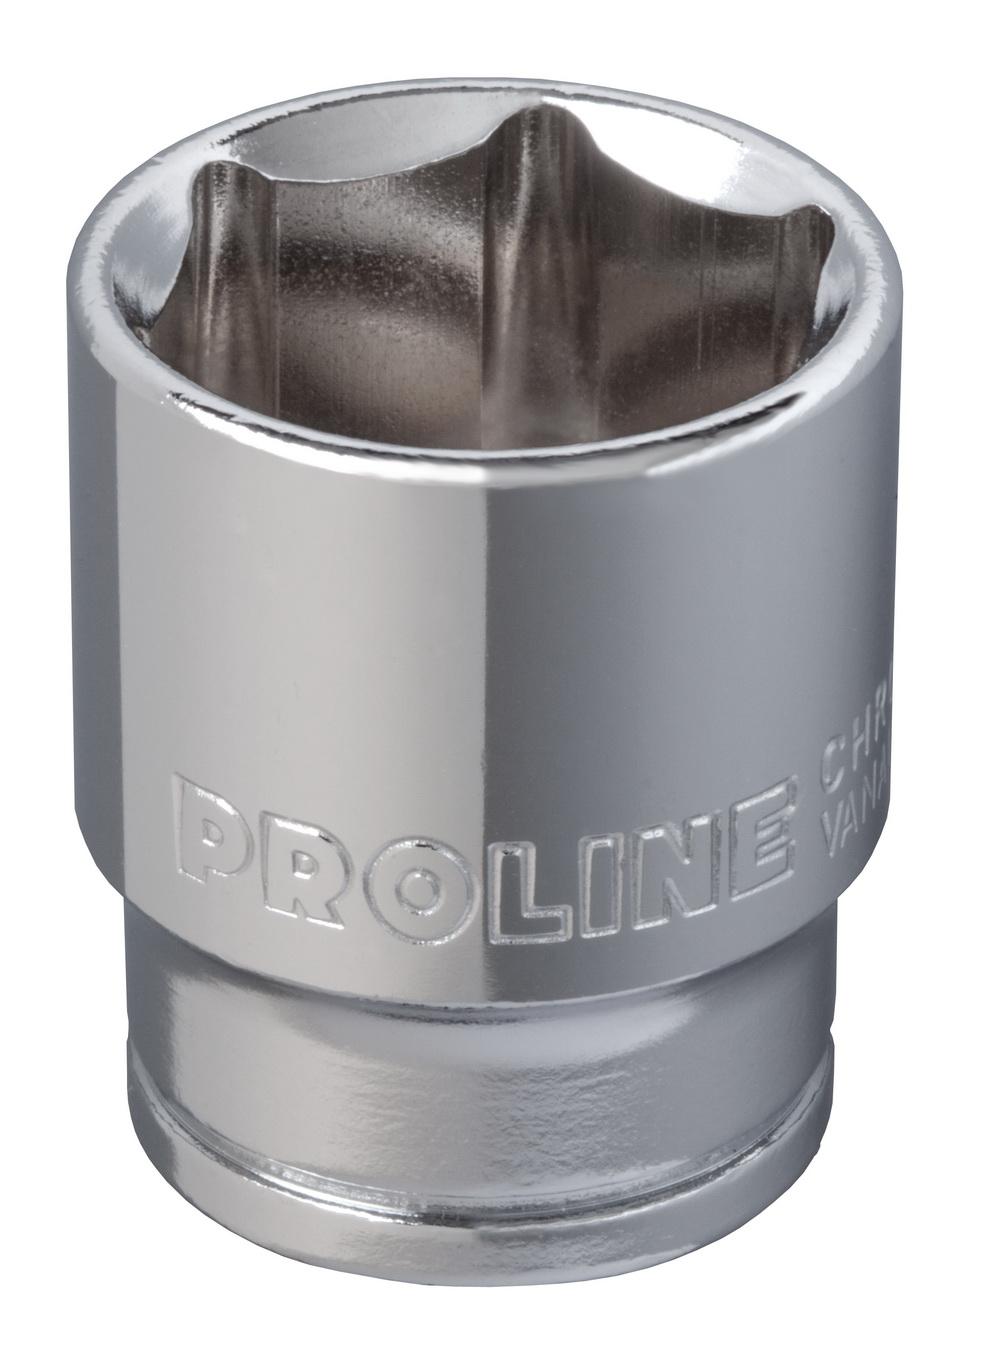 Головка Proline 18108:p 1kg l proline food grade l proline 99%